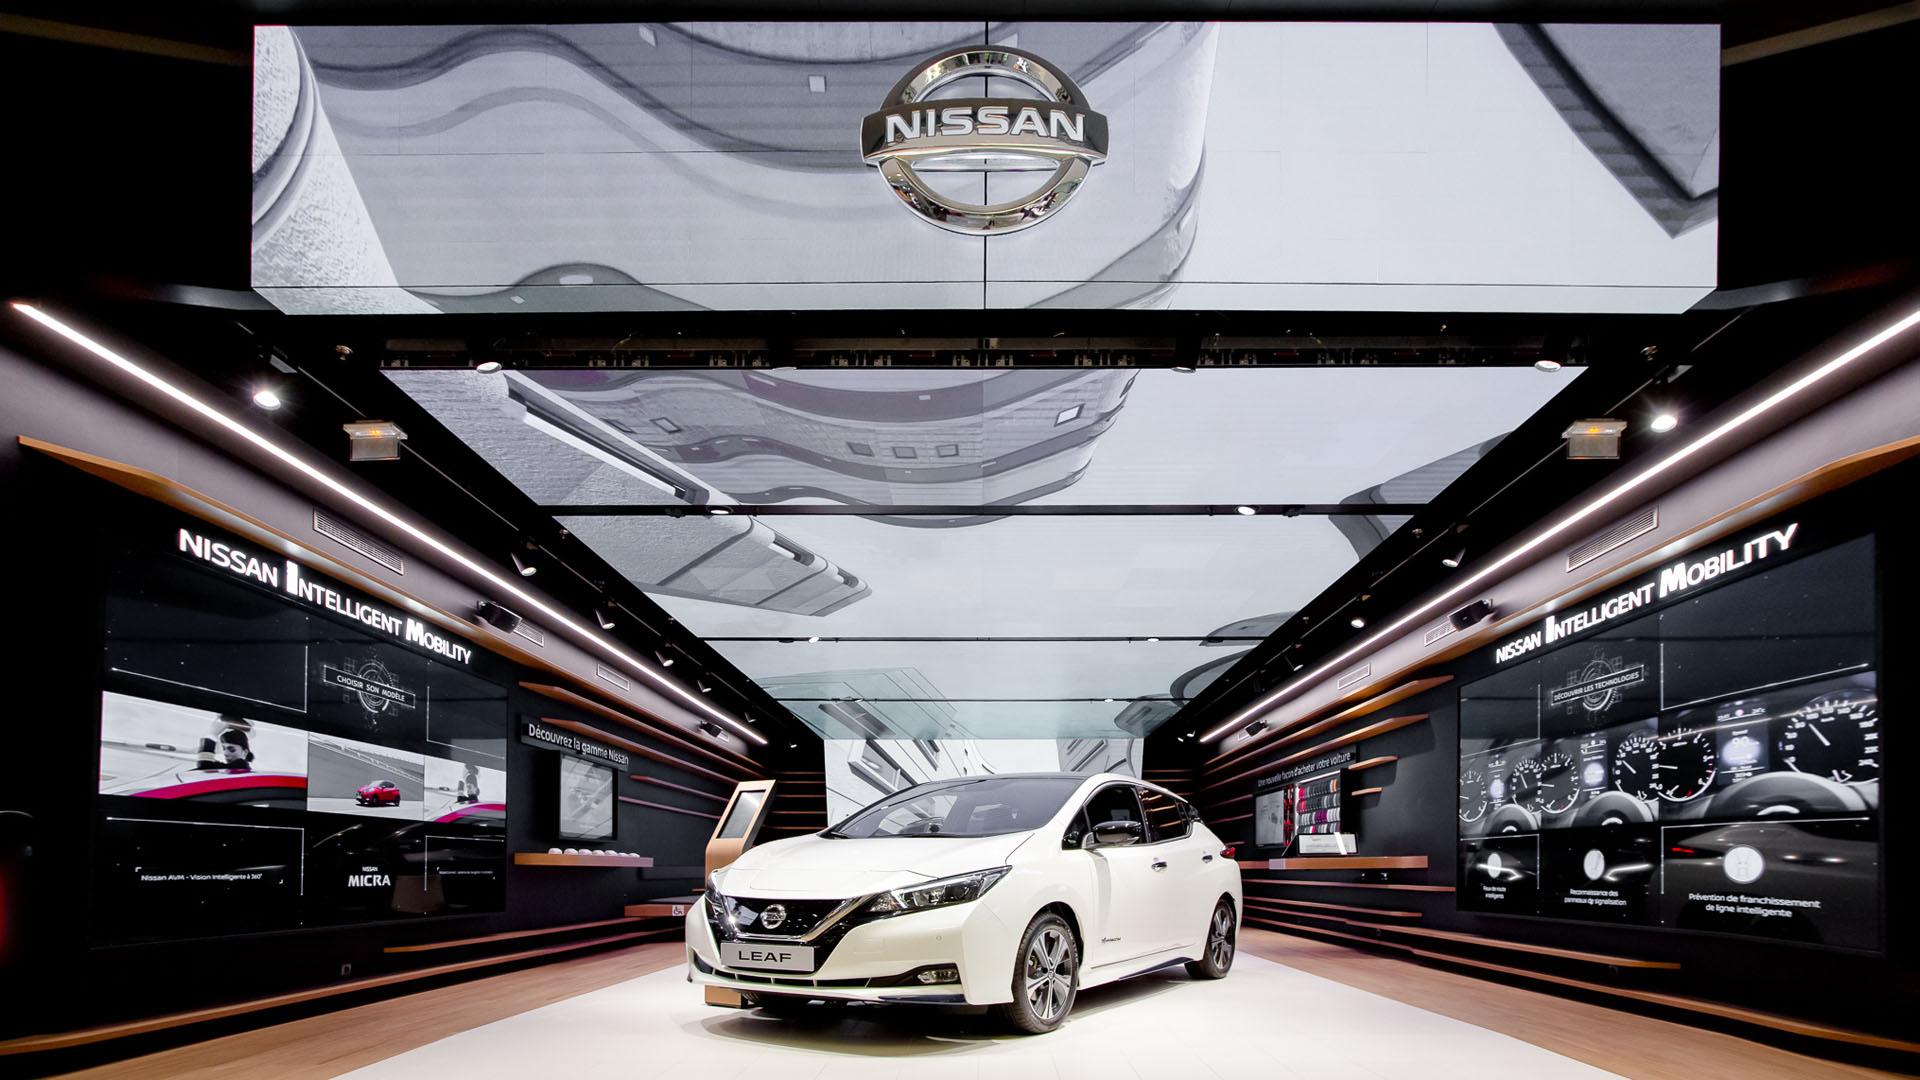 Nissan_Paris-8.jpg